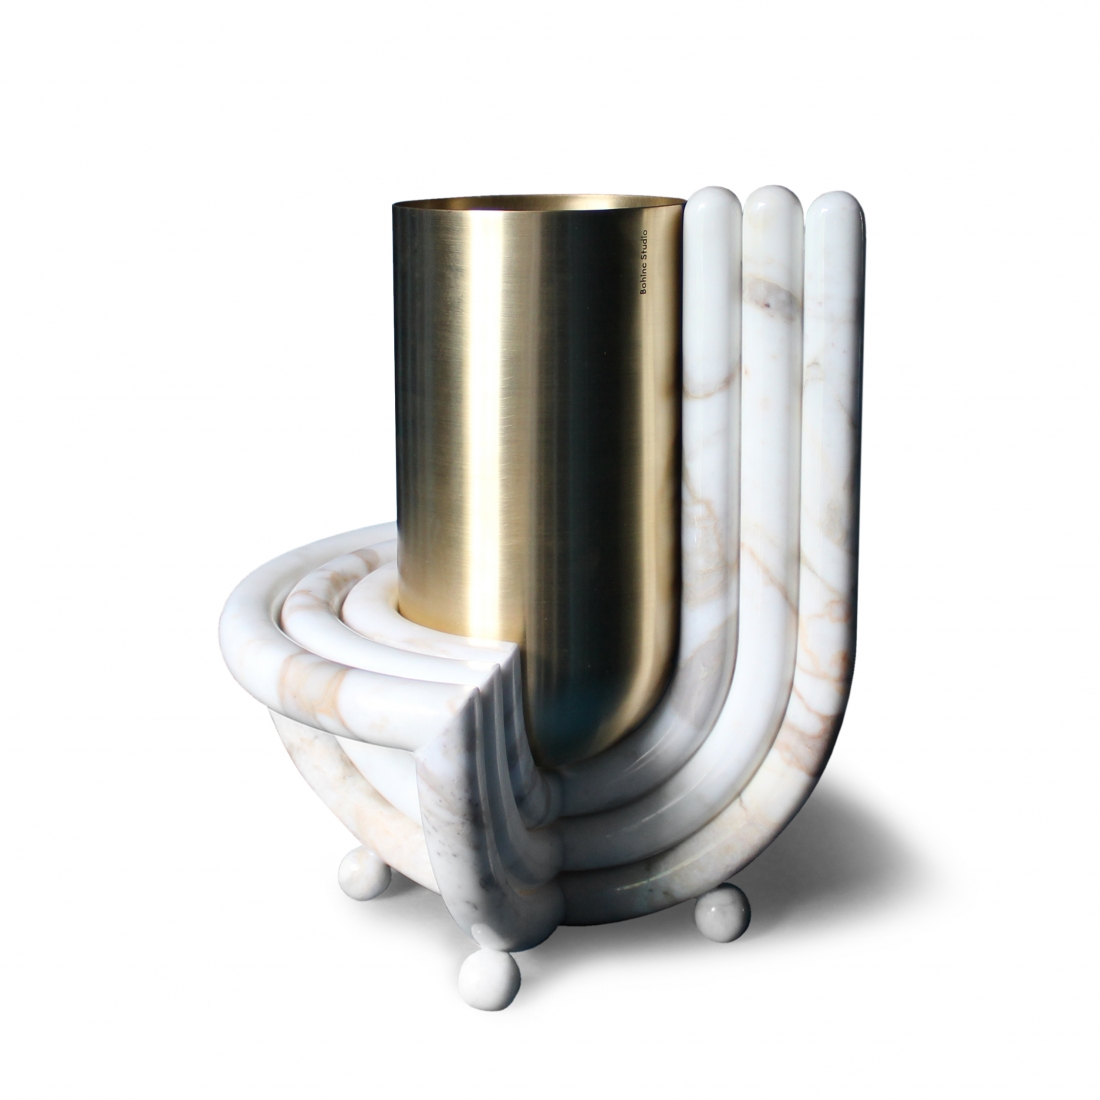 Bohinc Studio - Jupiter Vase